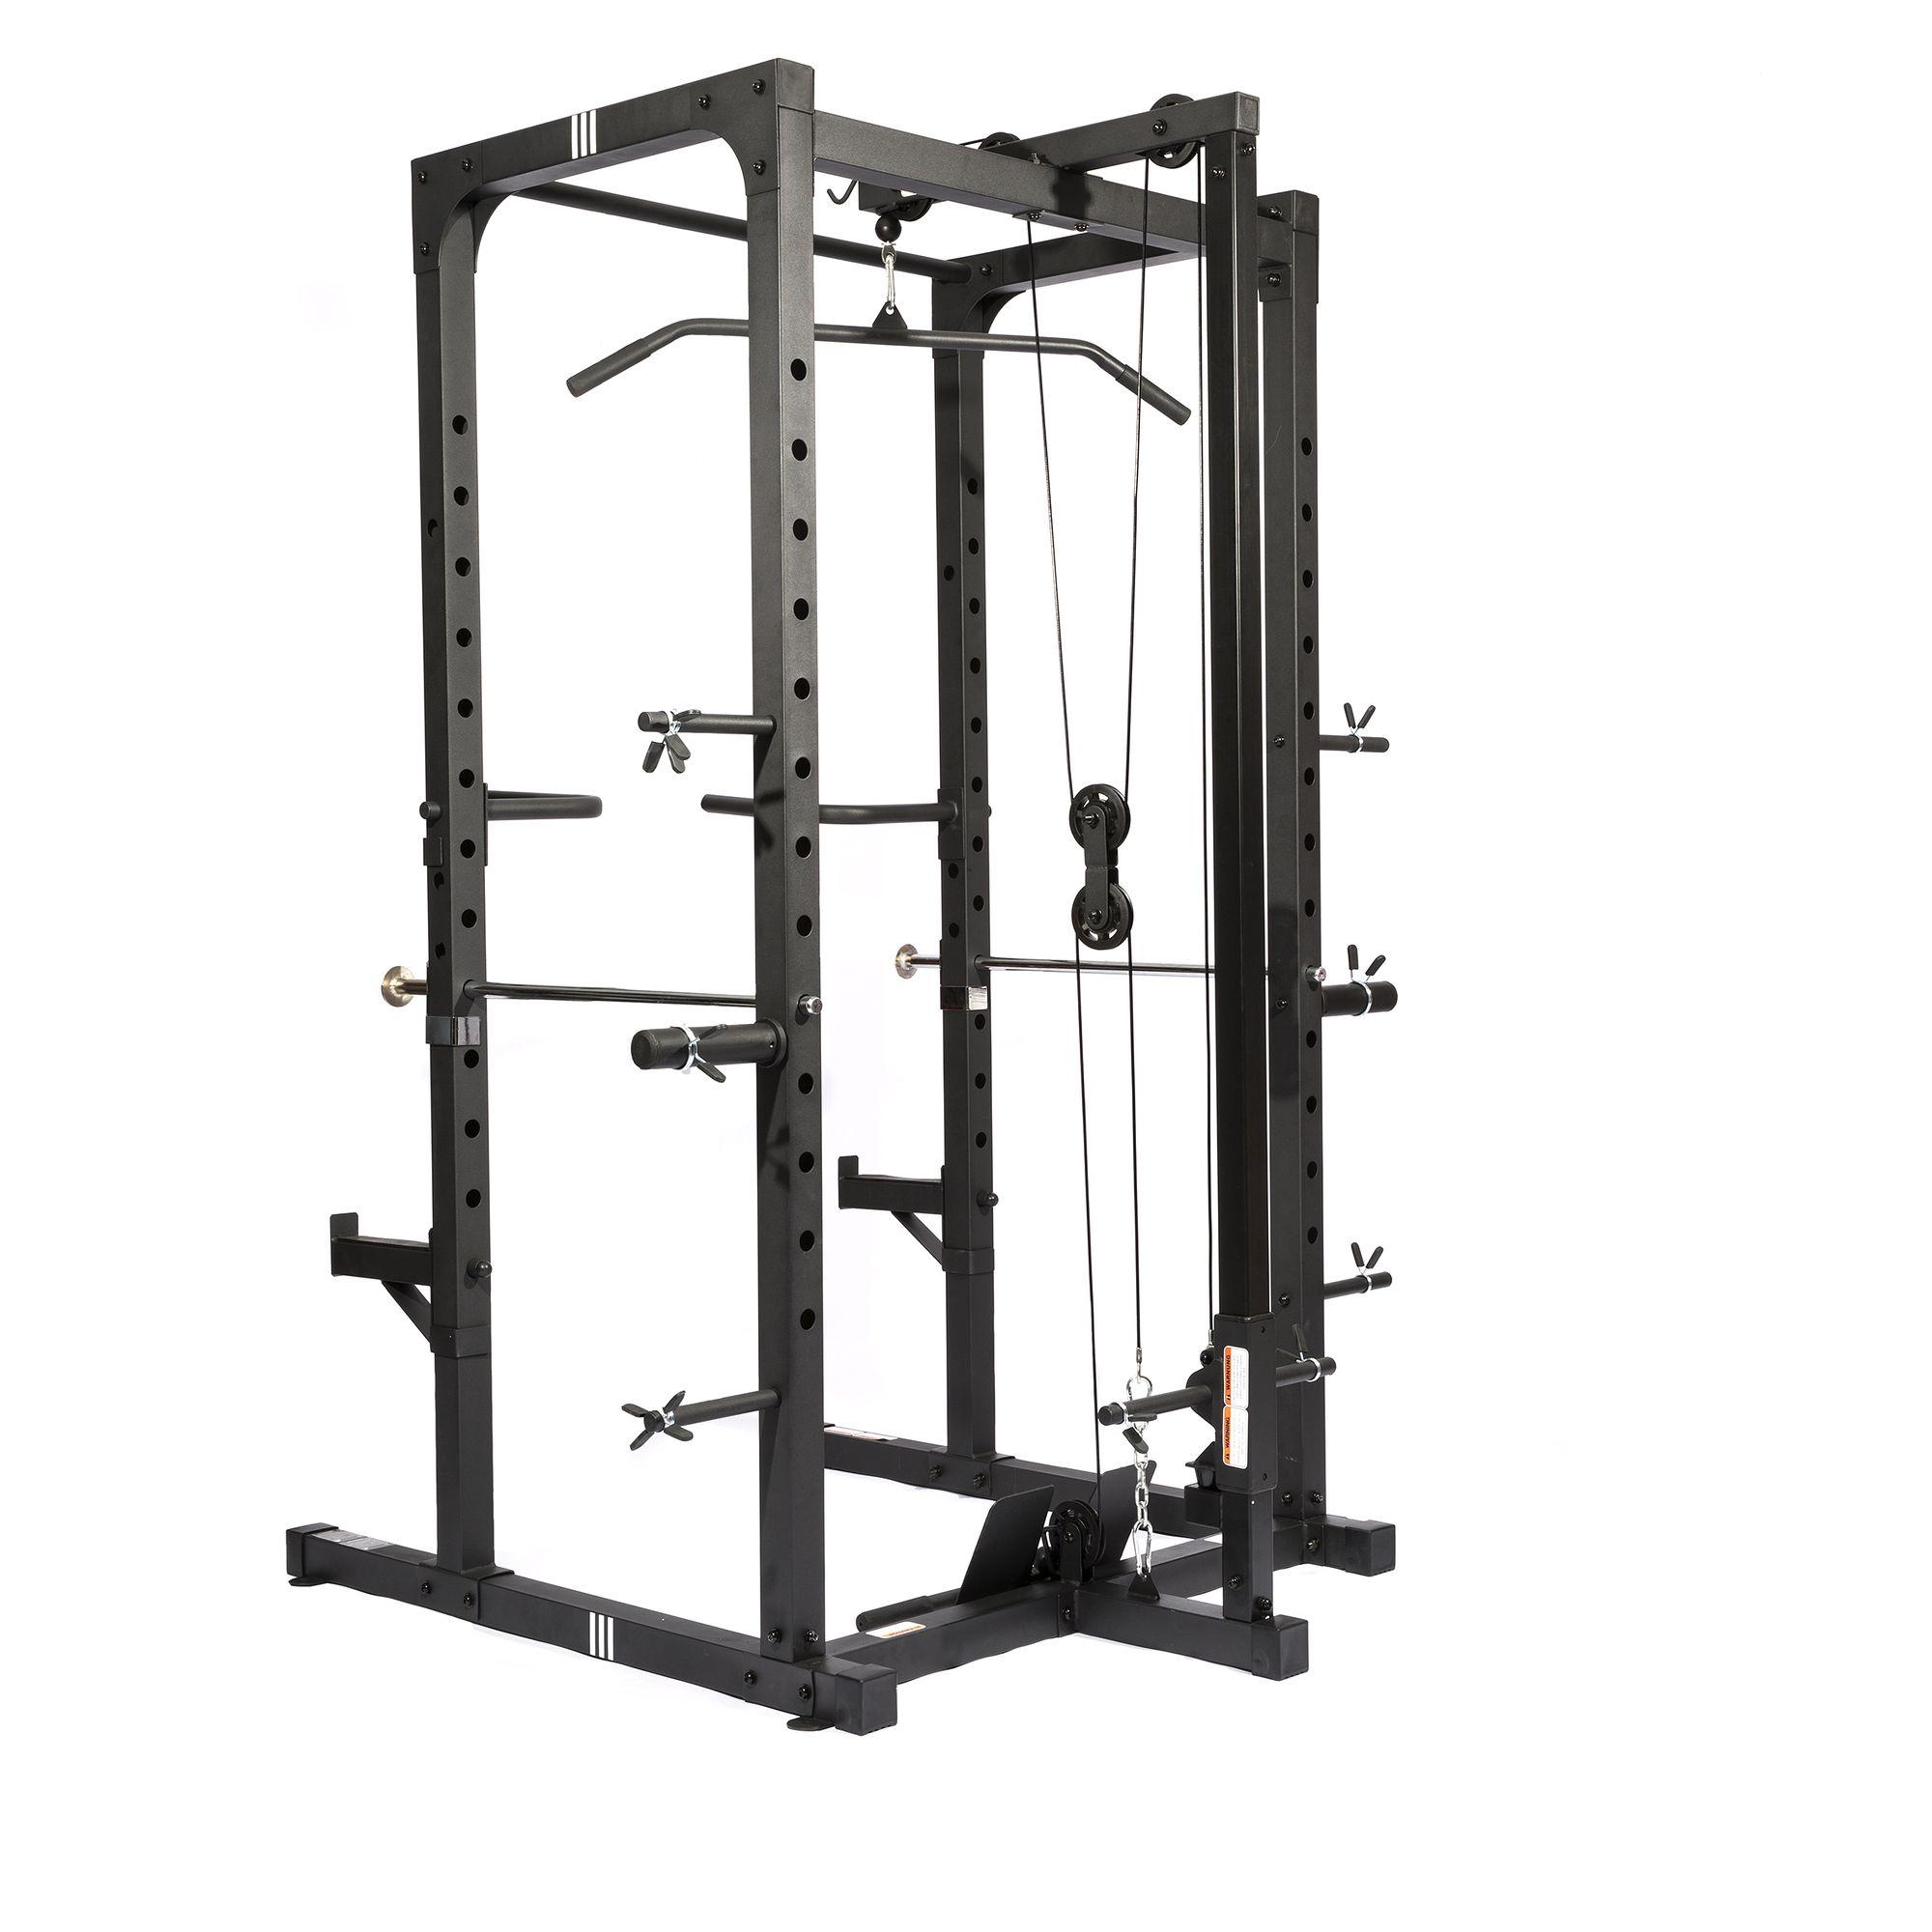 Station De Musculation Rack Home Rig Adidas Clubs  # Recherche Vestiaire A Transforme En Rack Sono